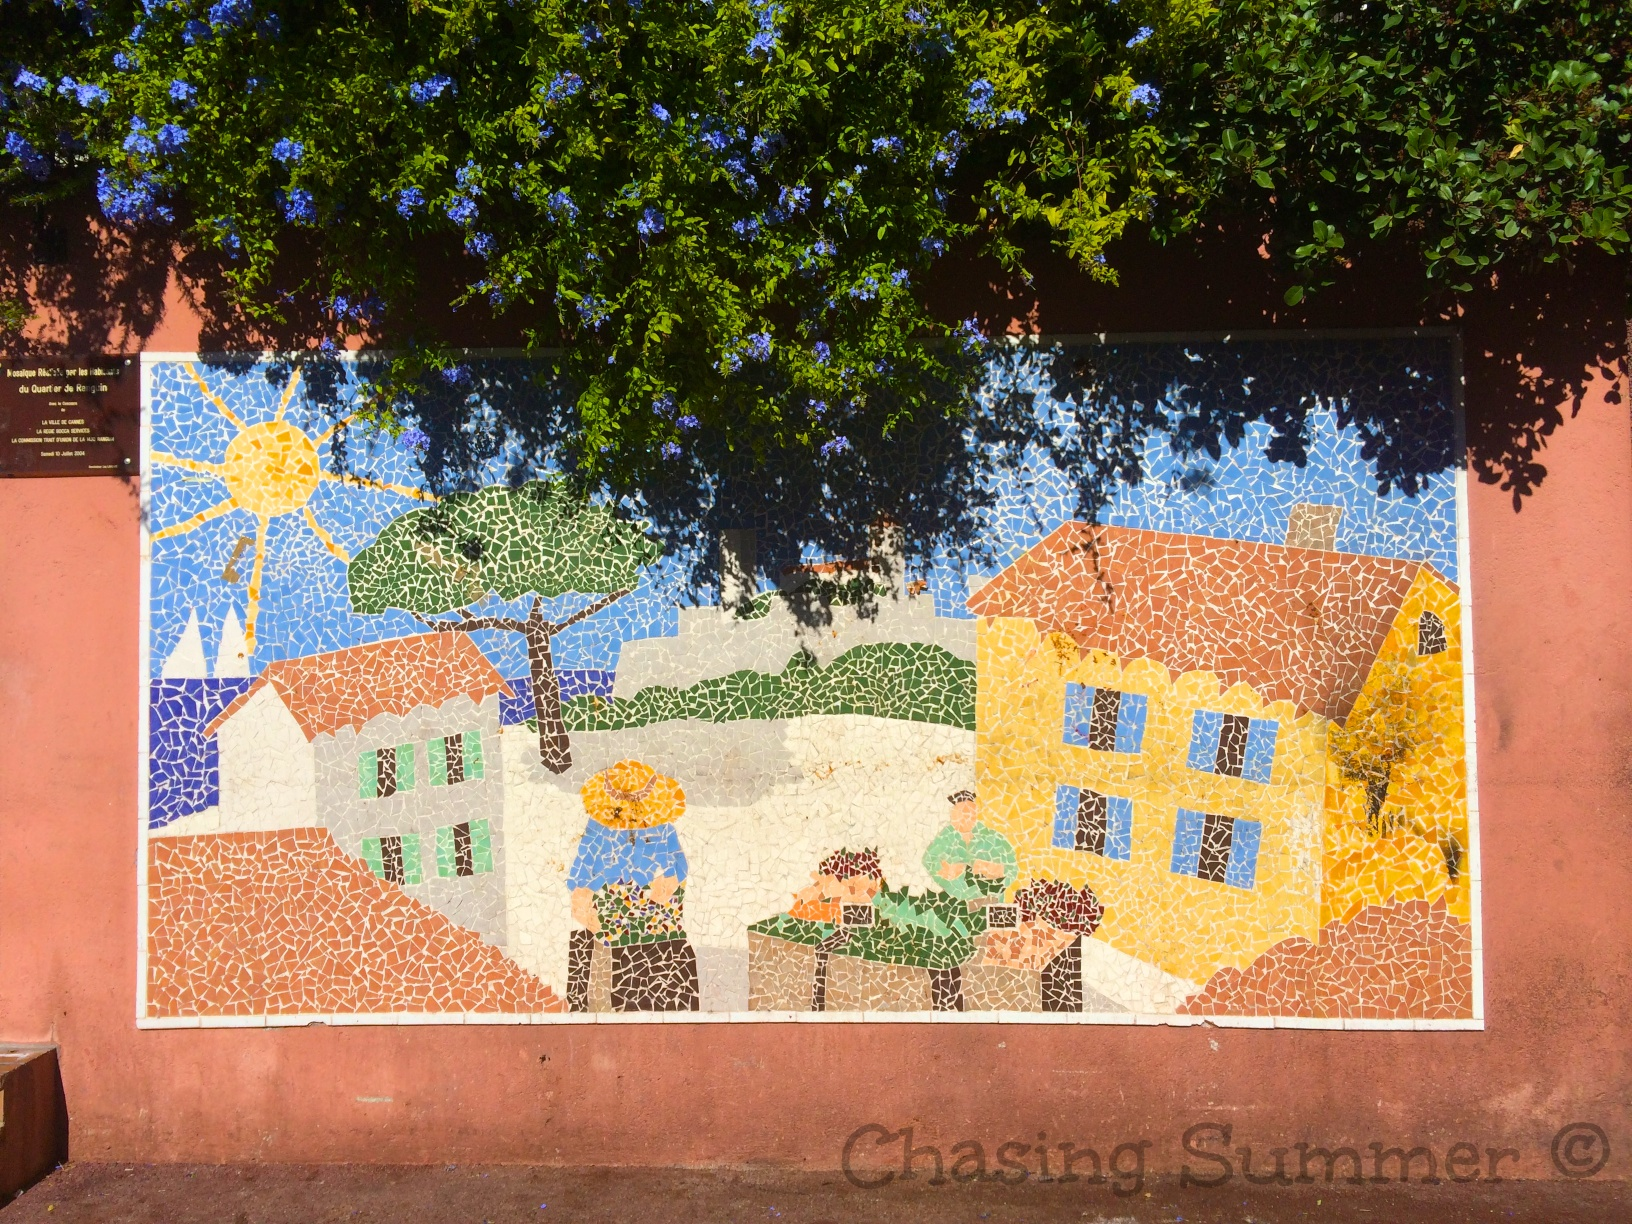 Fruit and Vegetable Market's Mosaic Art piece